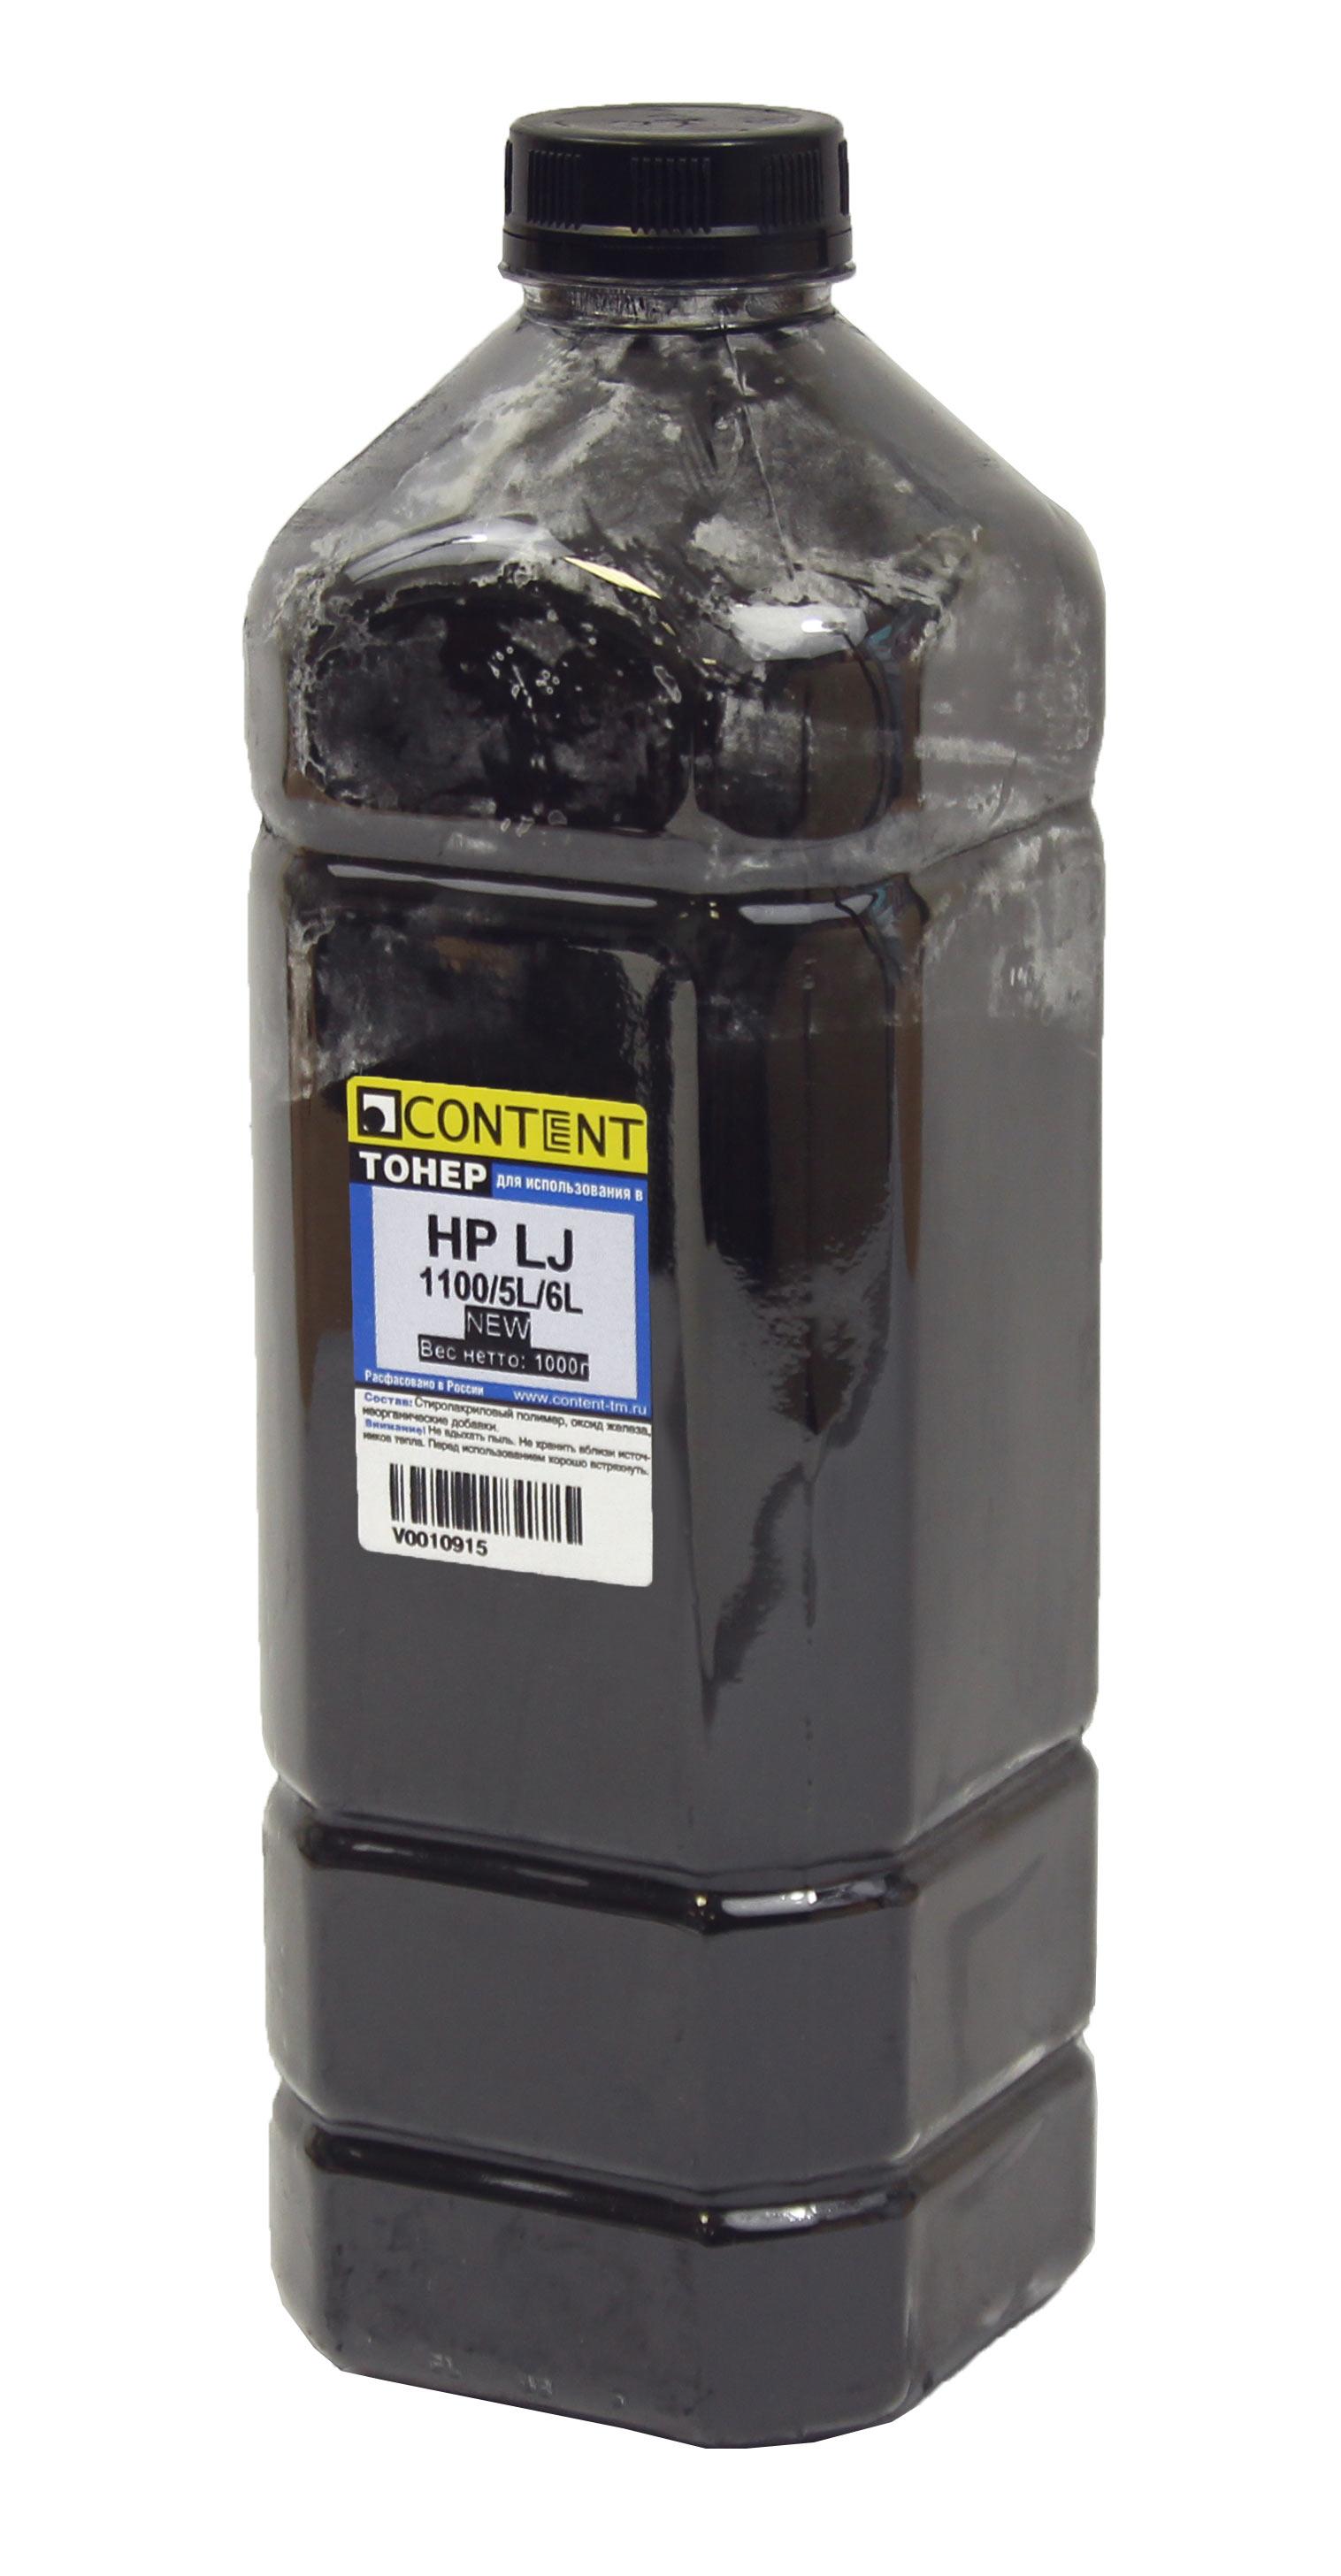 Тонер Content для HP LJ 1100/5L/6L, Bk, 1 кг, канистра